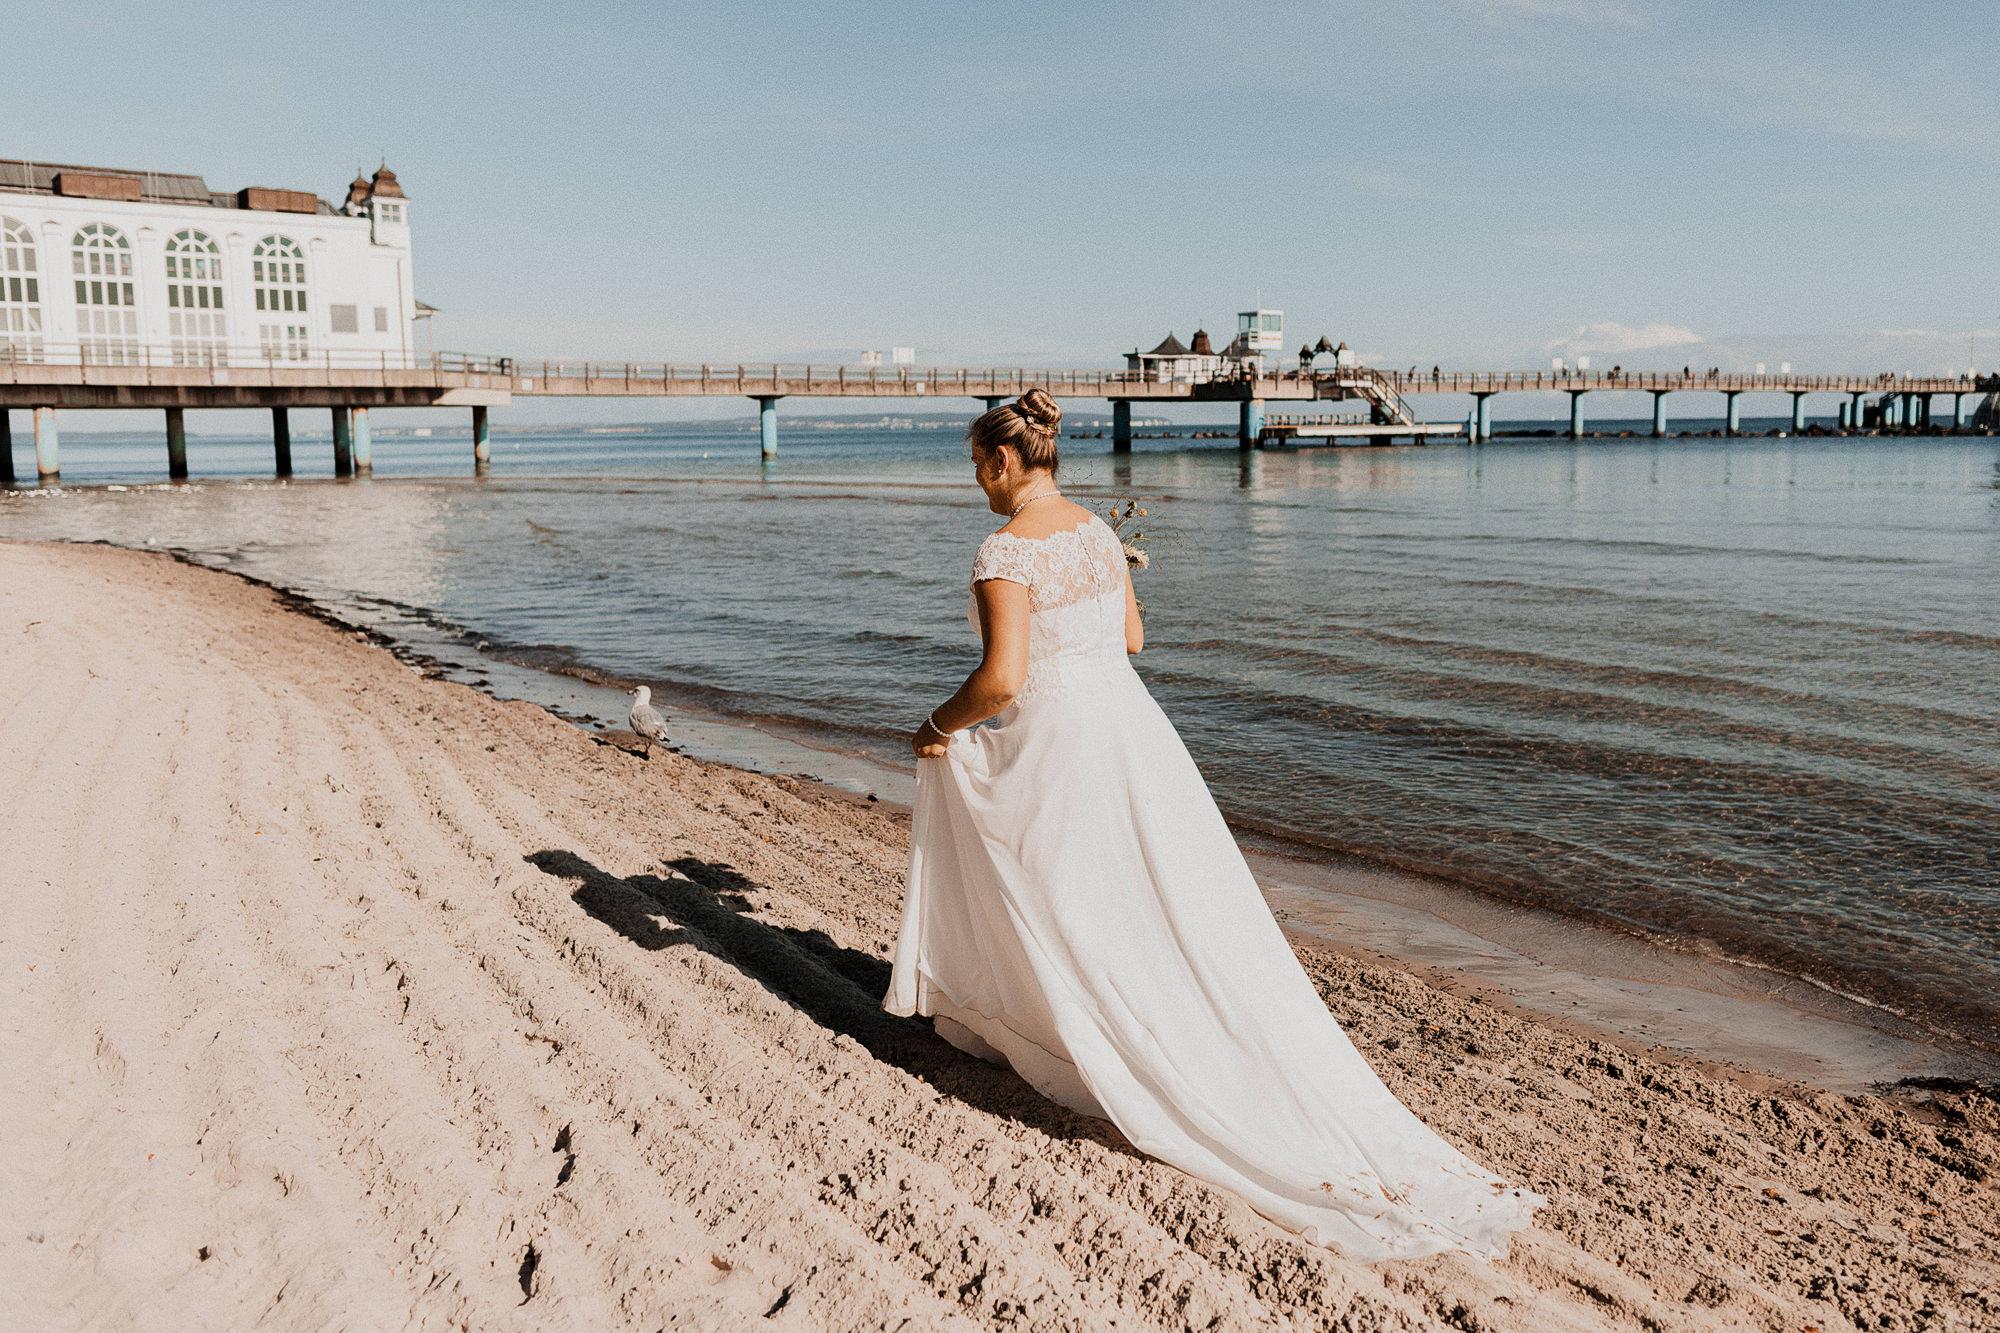 Brautpaarshooting in Warnemuende - After Wedding Fotografie in Rostock - bucht ein Paarshooting an der Ostsee